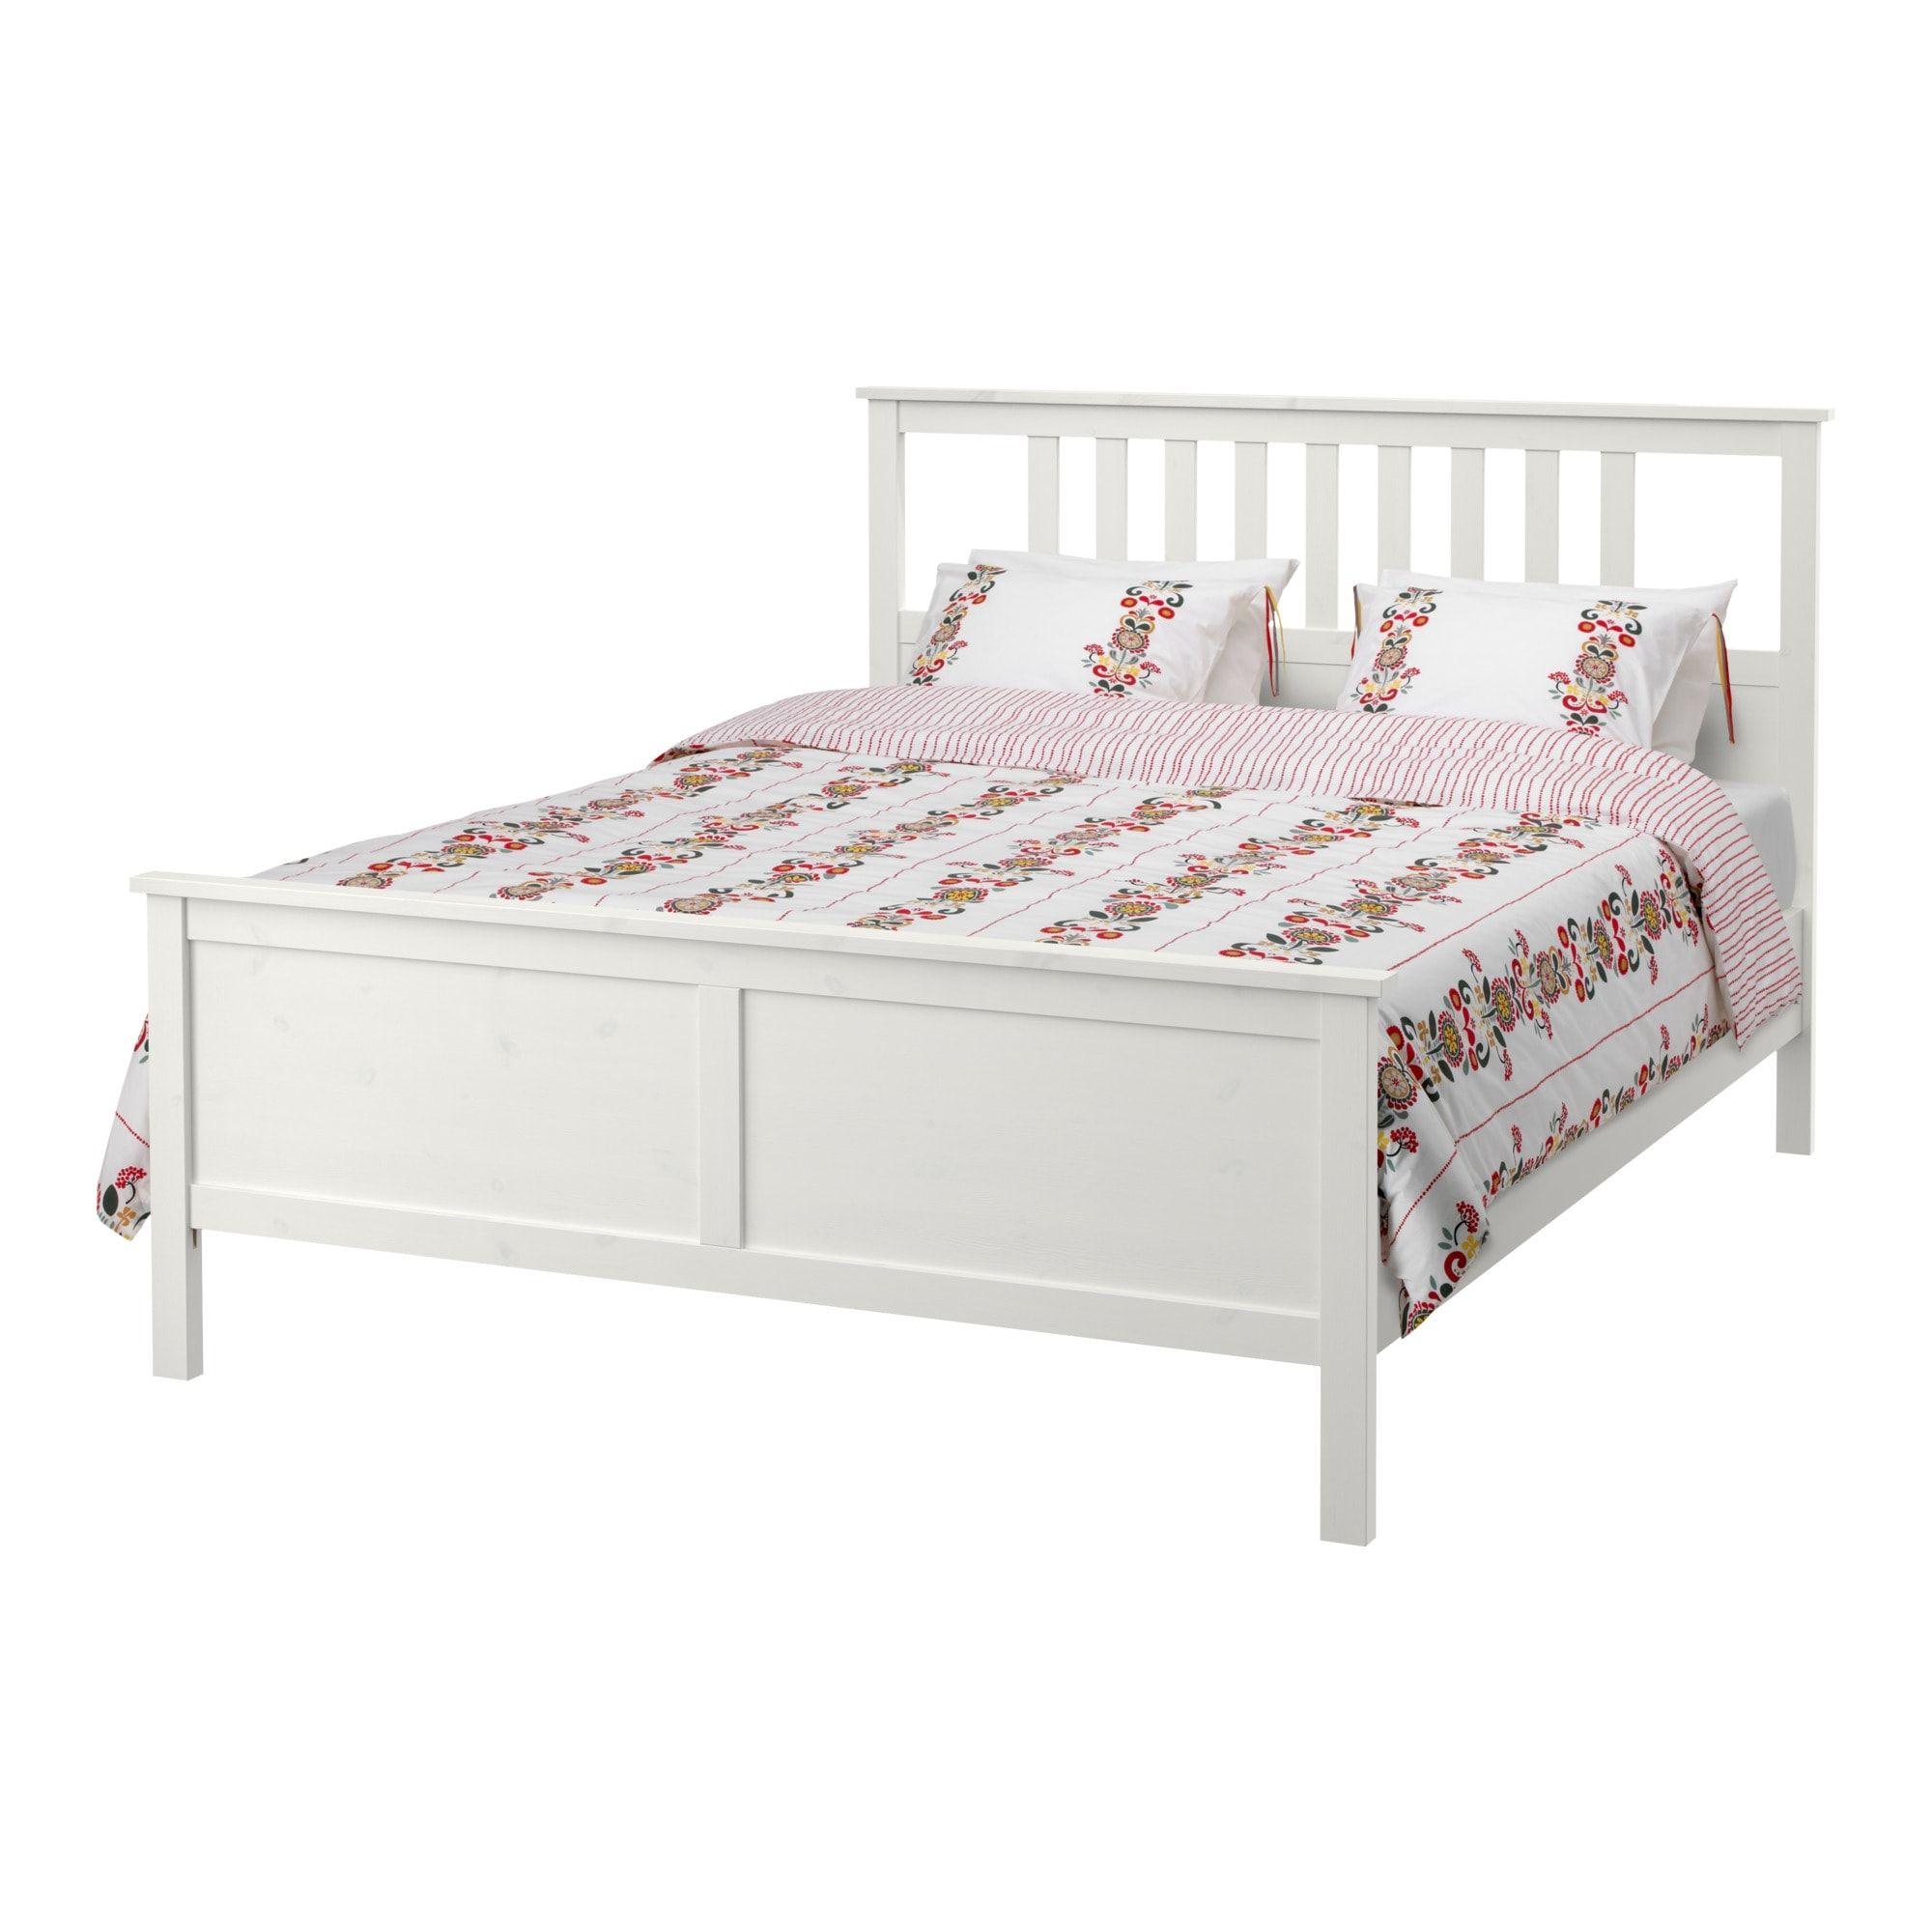 HEMNES Bed frame white stain Full/Double Ikea bed